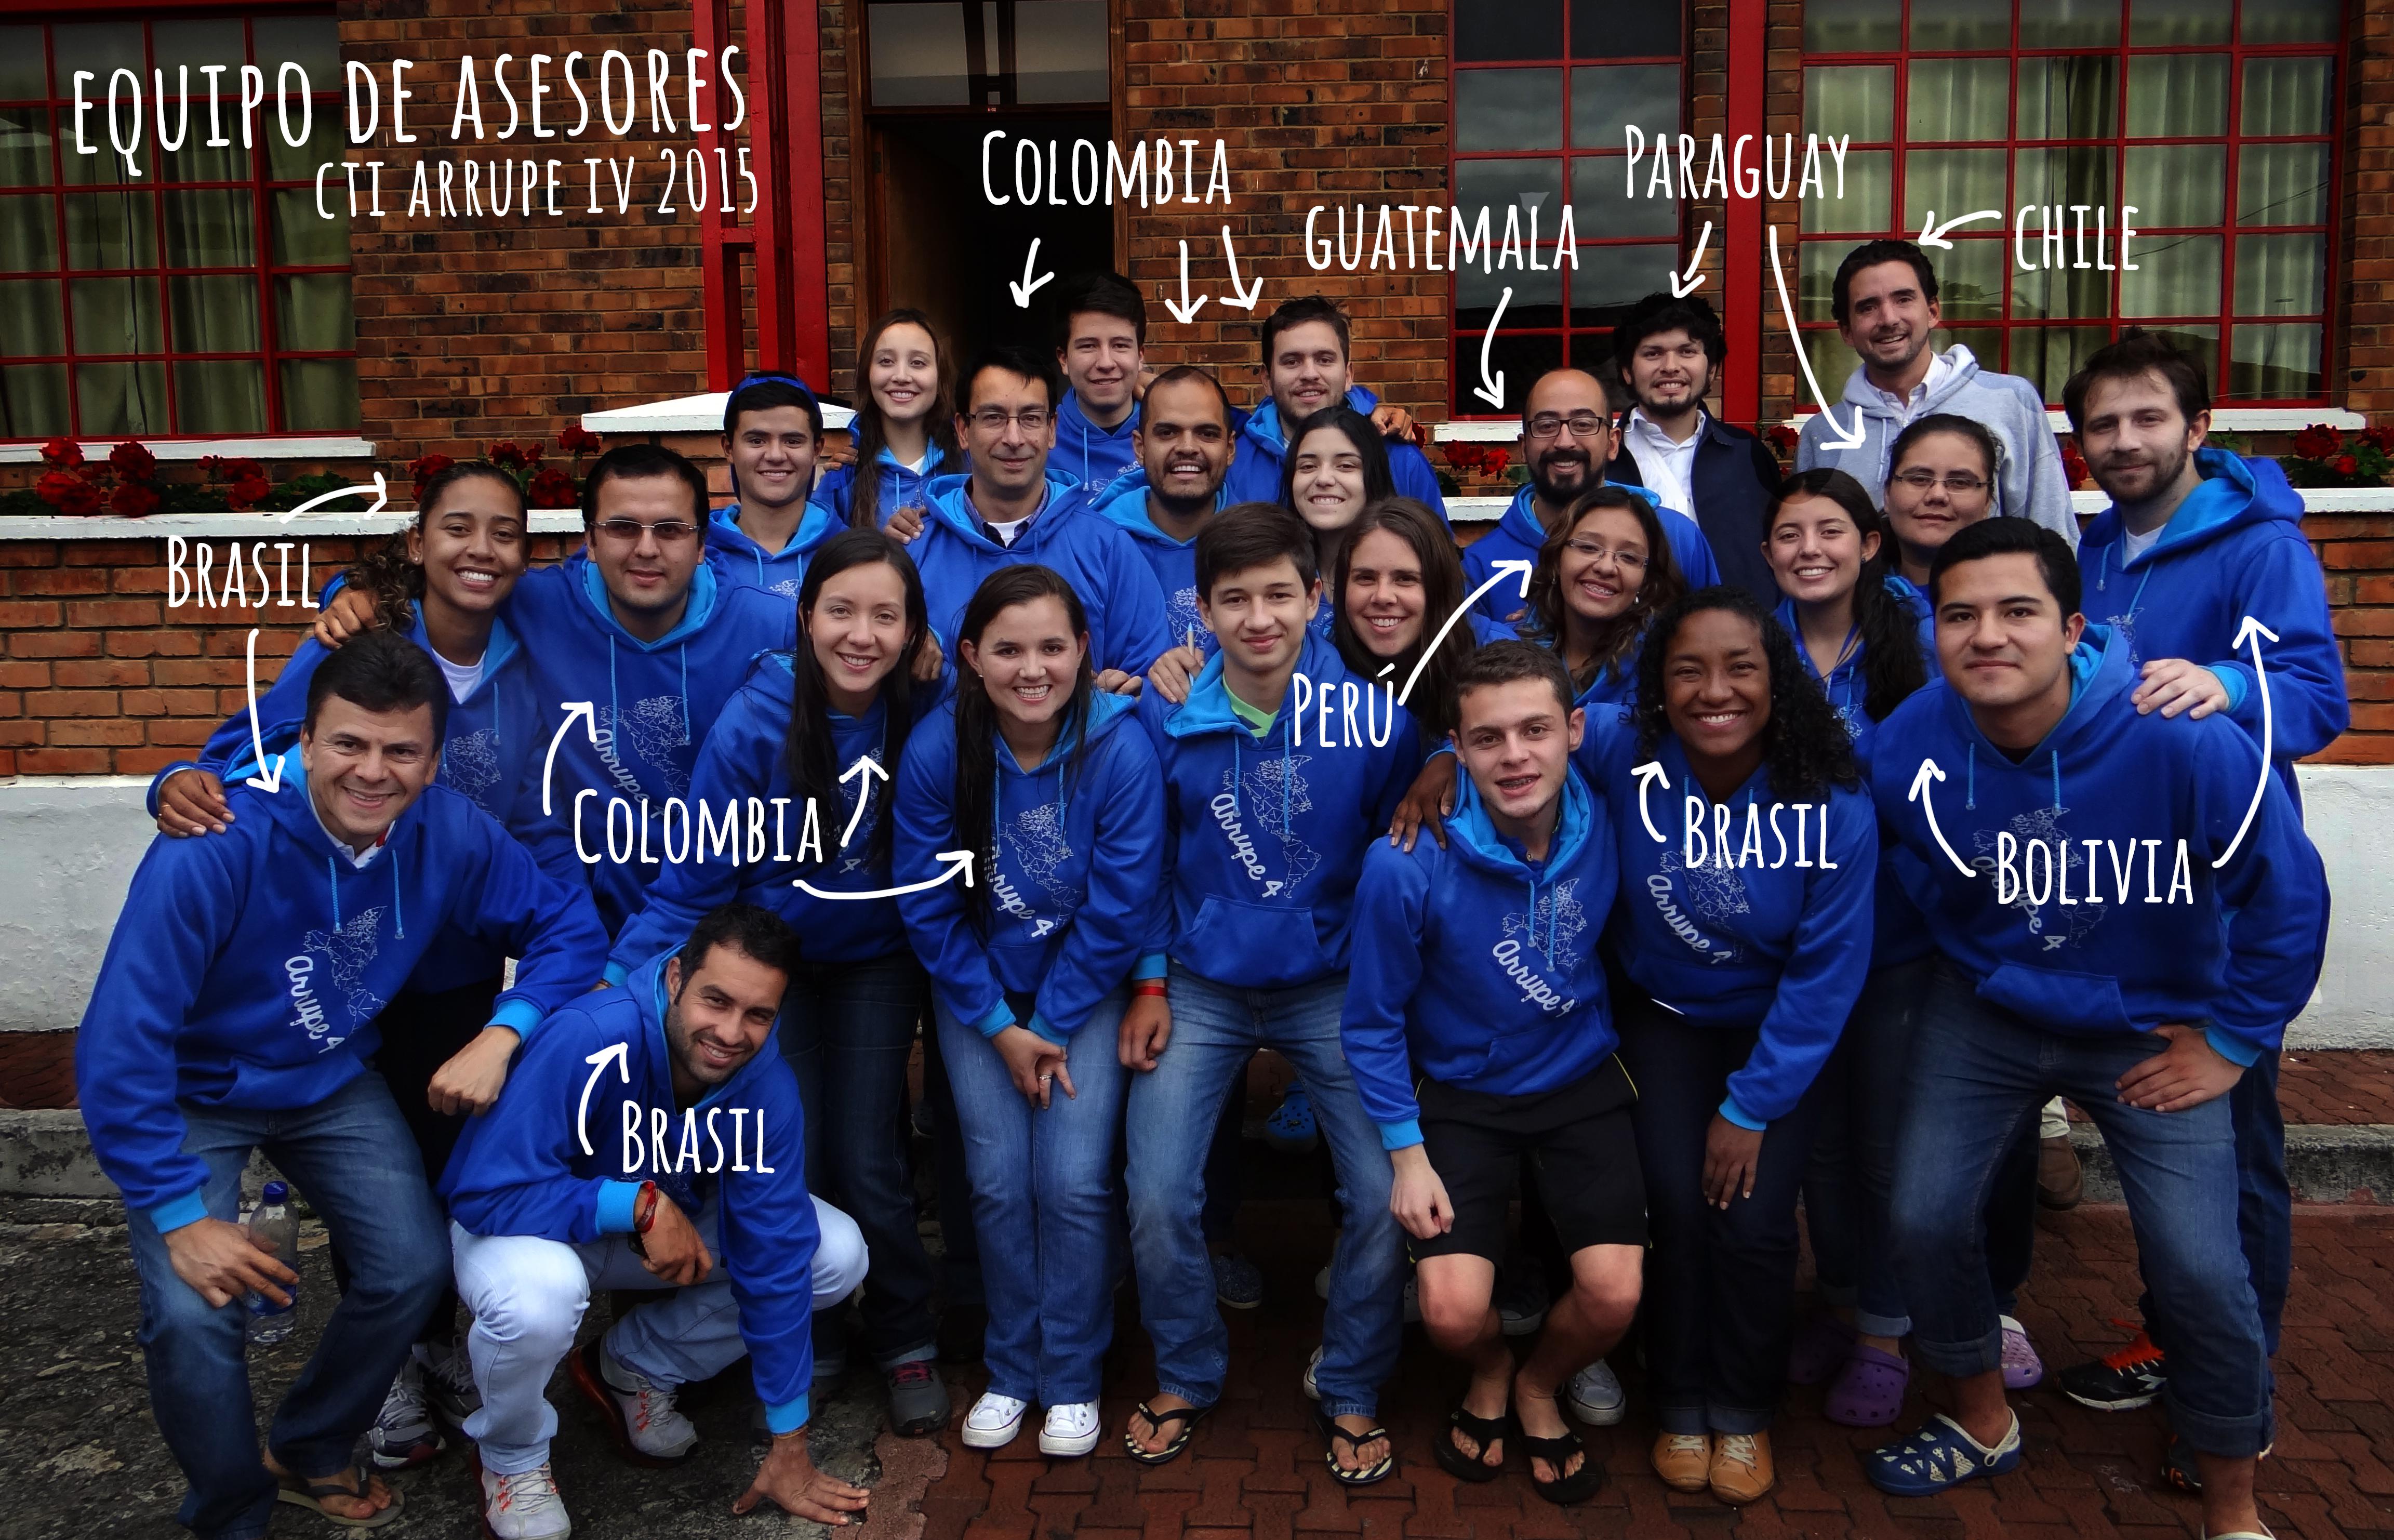 Foto-formal-equipo-asesores